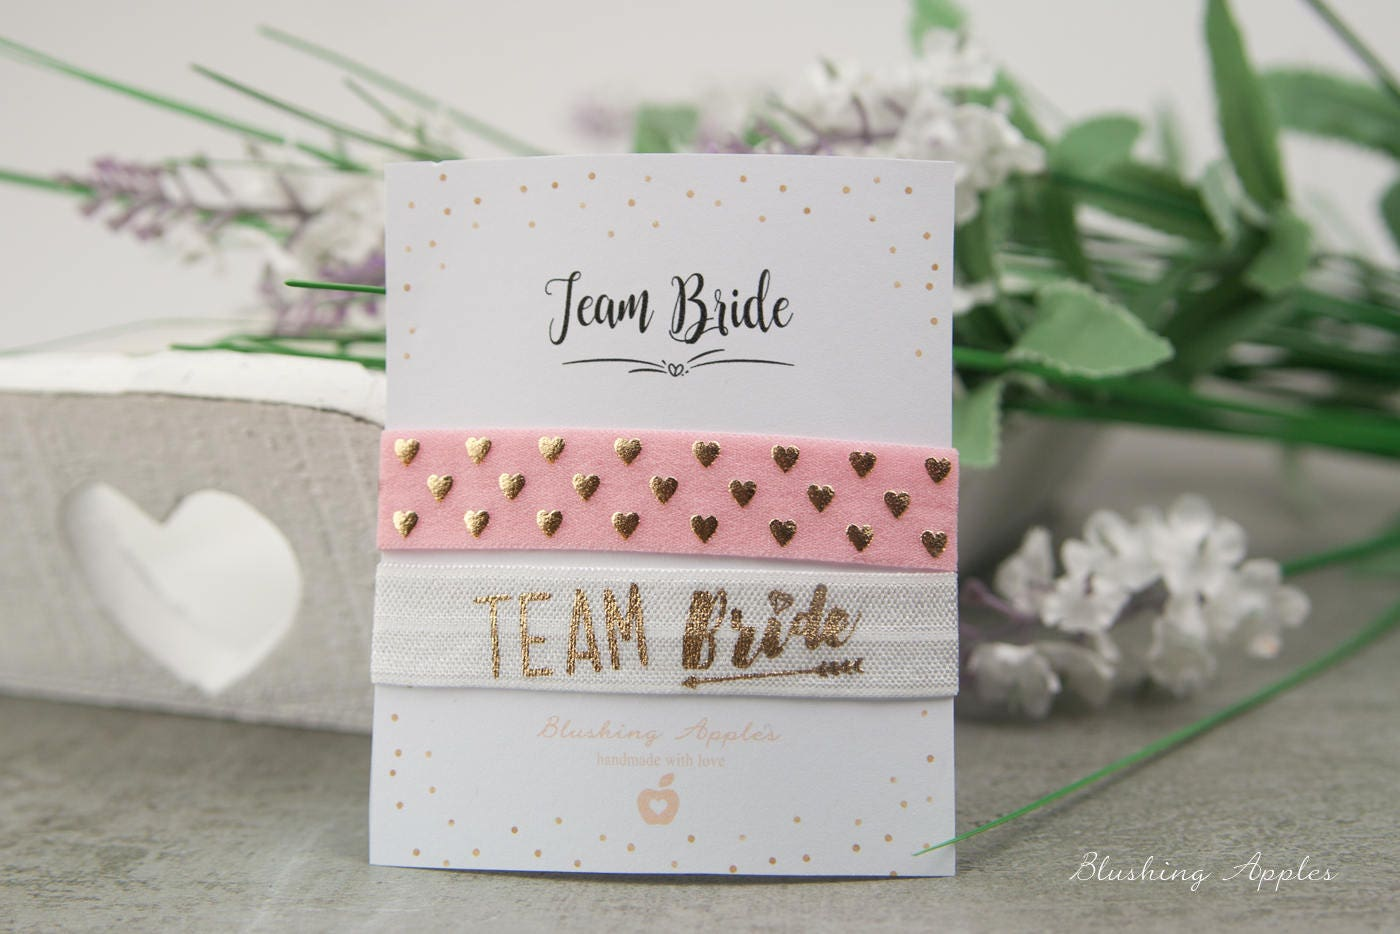 Armband Set Team Bride / Hochzeit JGA Team Braut